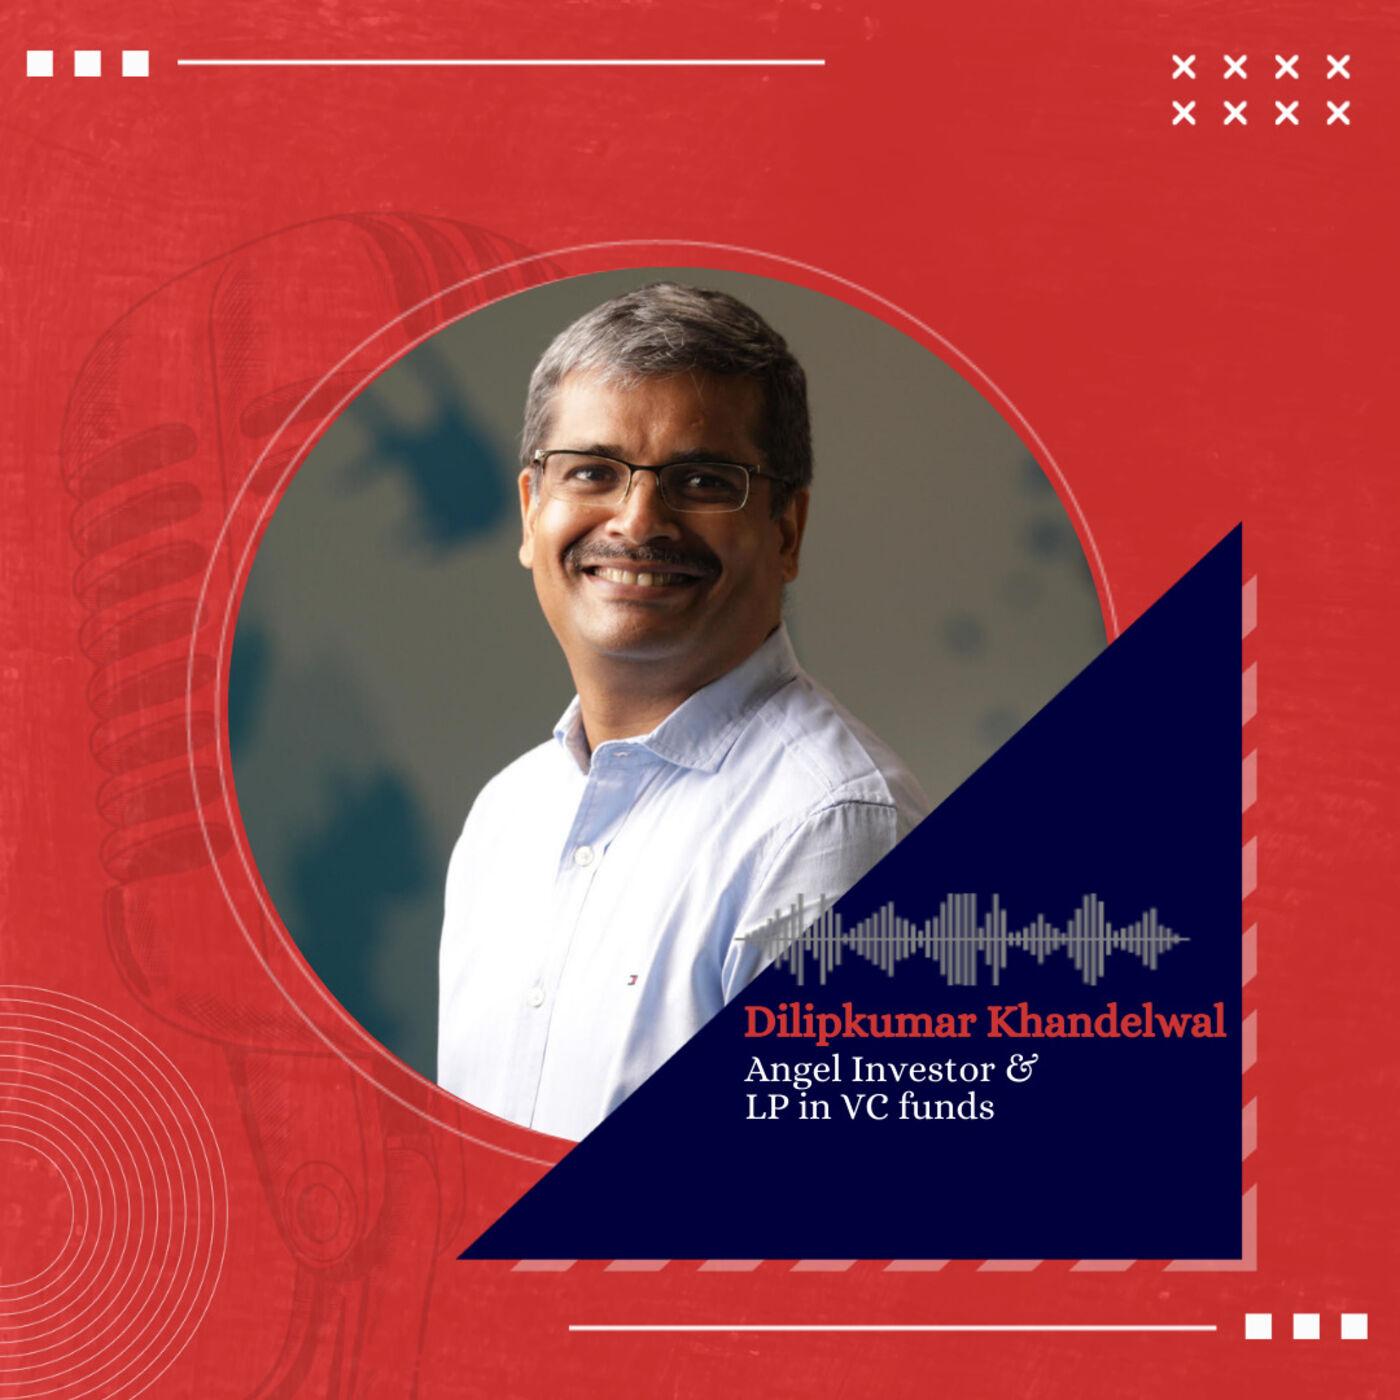 Dilipkumar Khandelwal on building a strong portfolio of B2B SaaS companies as an Angel Investor